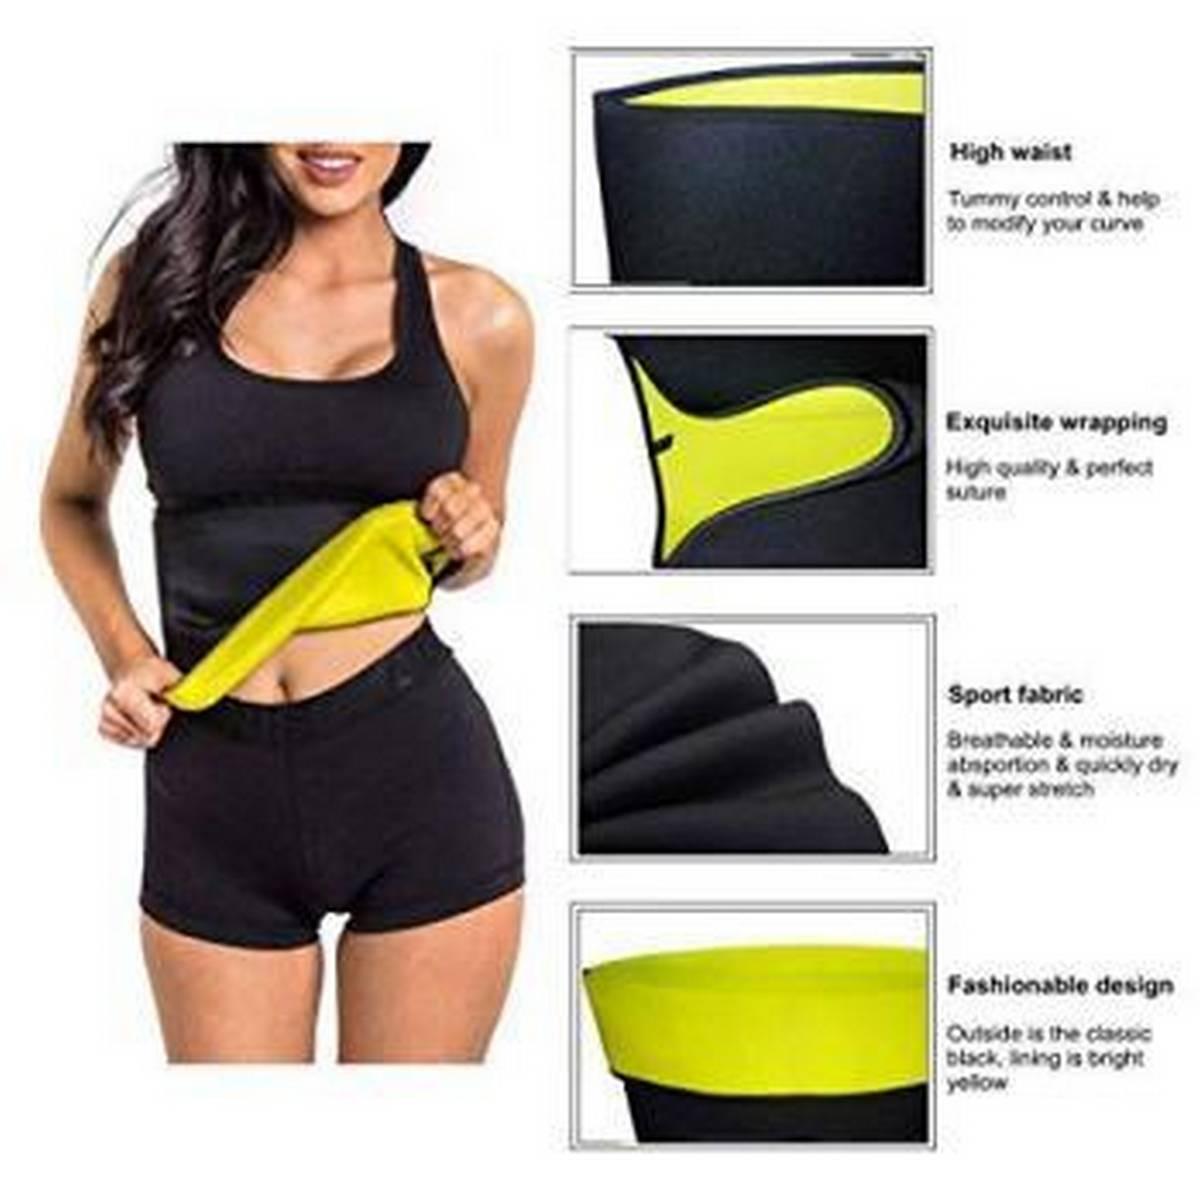 Men & Women Weight Loss Slimming Belt Body Shapper, Body Fat Burner Hot Shapper Product By Shopping Addict